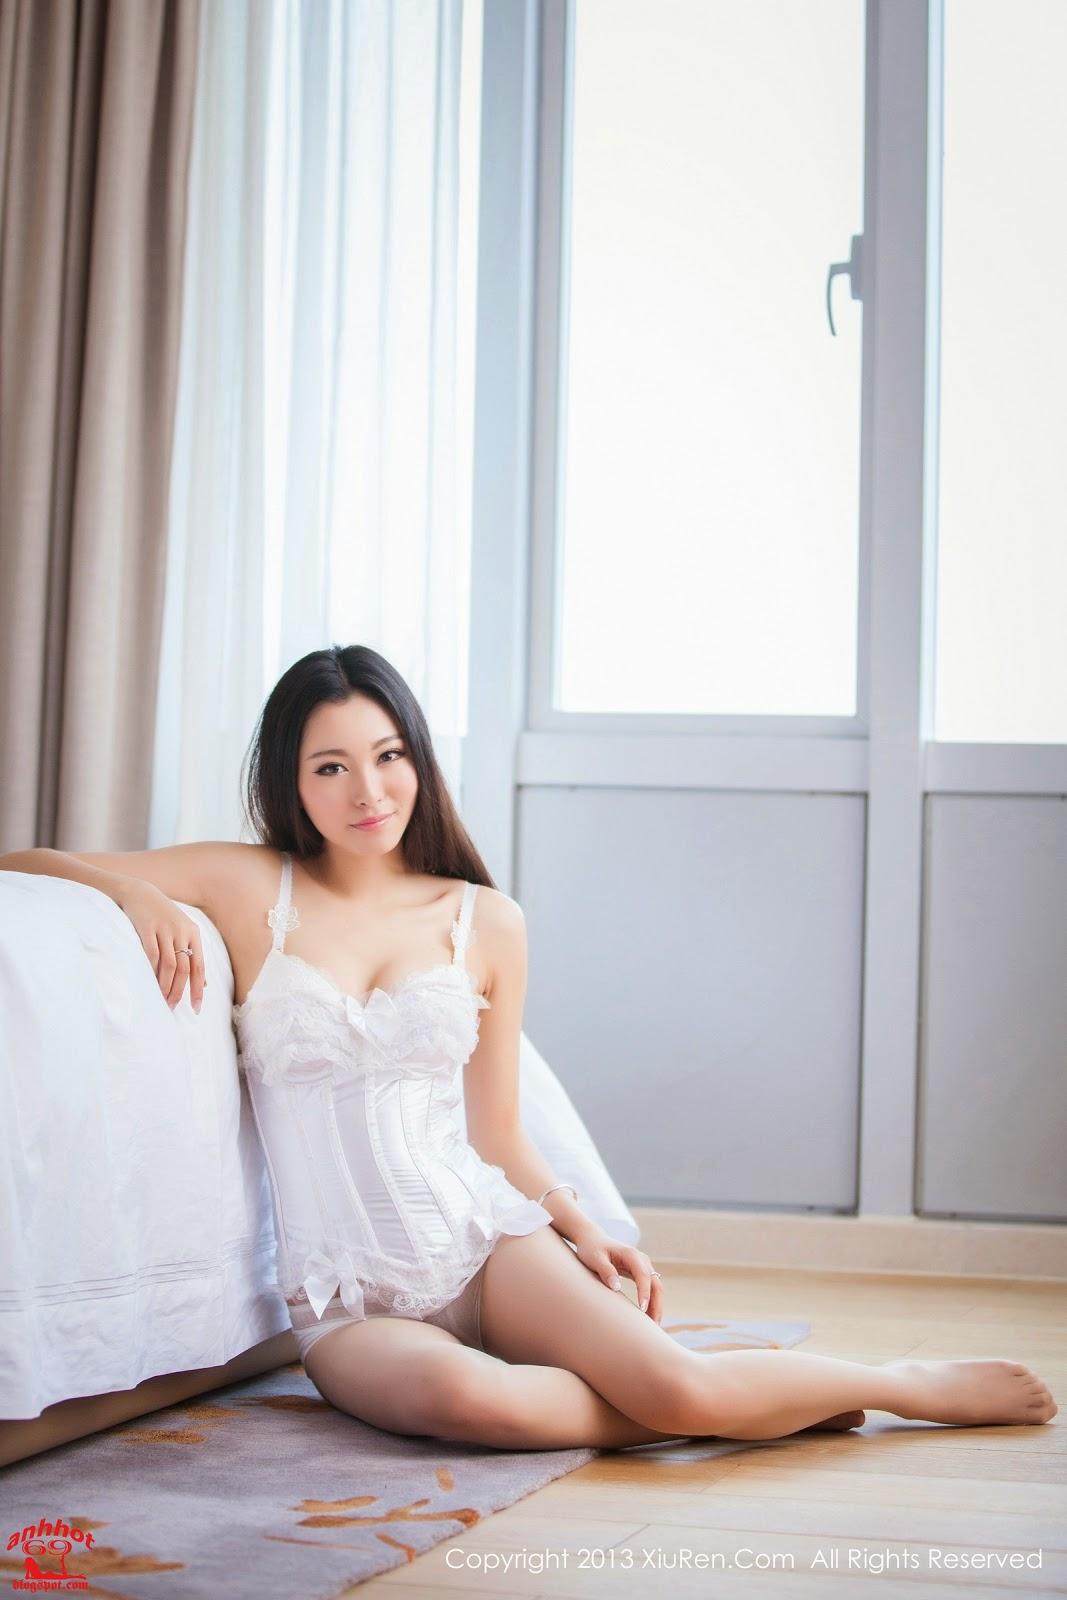 xiuren-xiuren-02491645